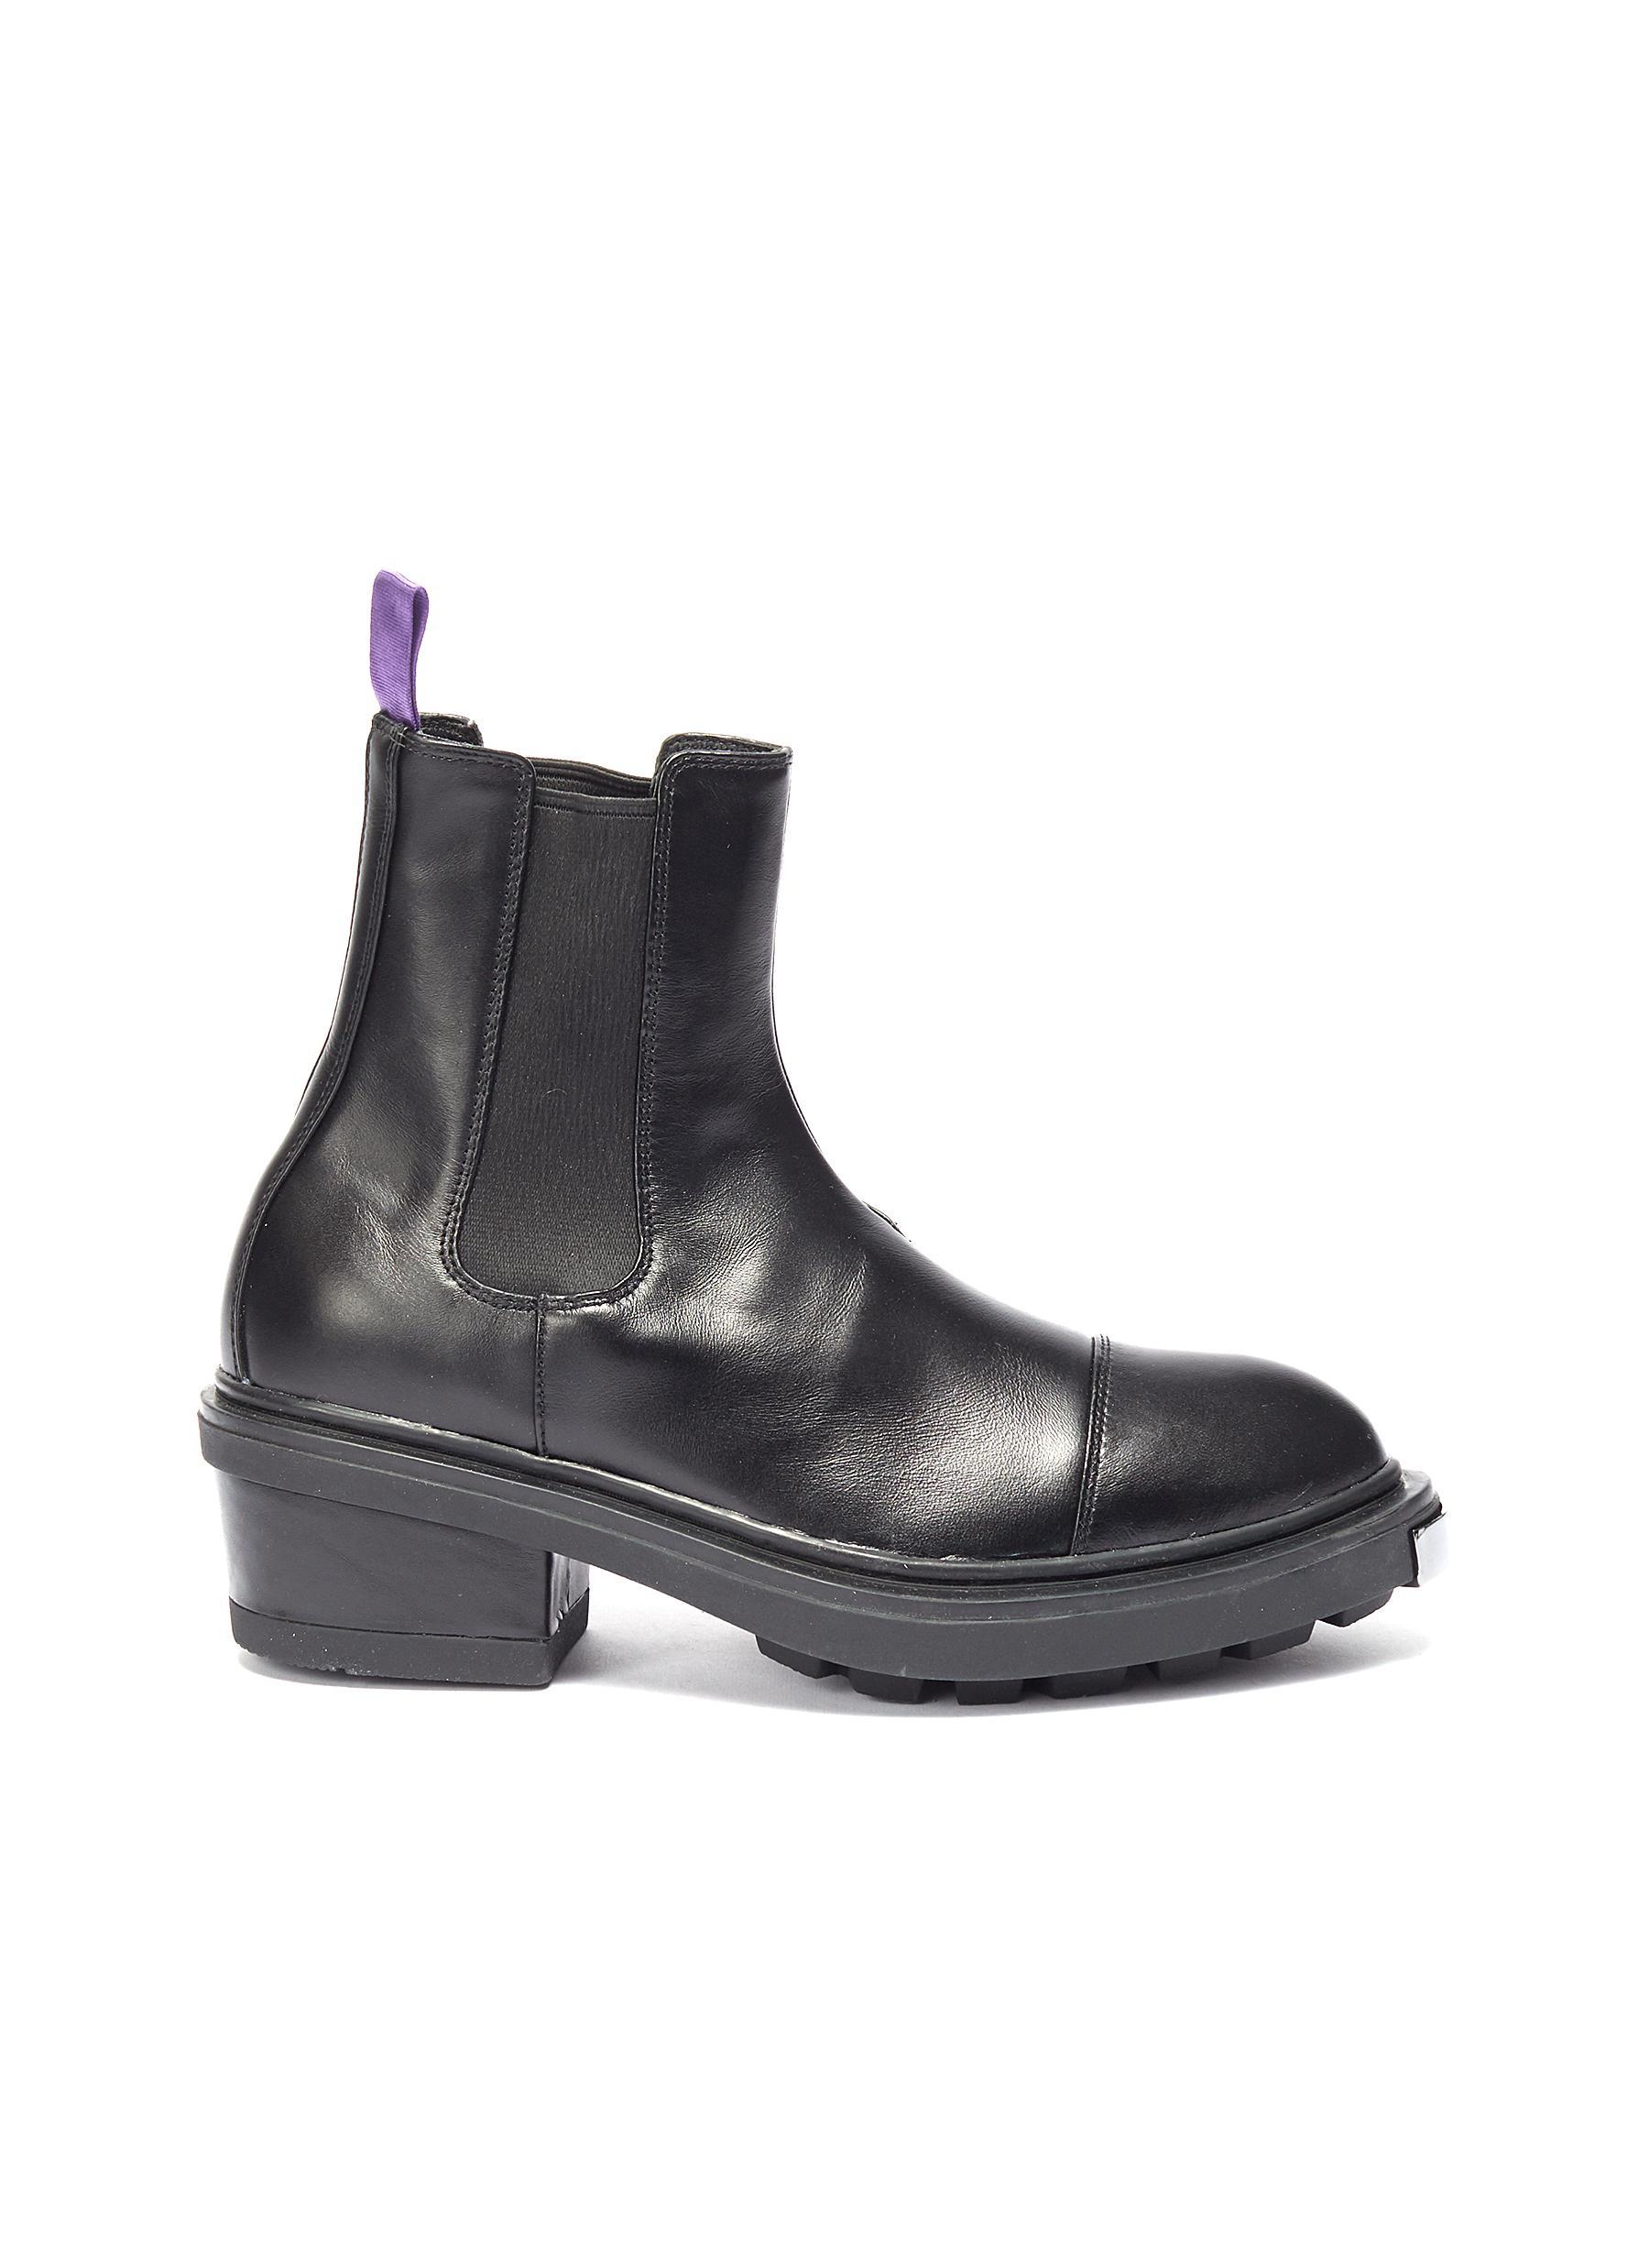 Nikita metallic bumper leather Chelsea boots by Eytys